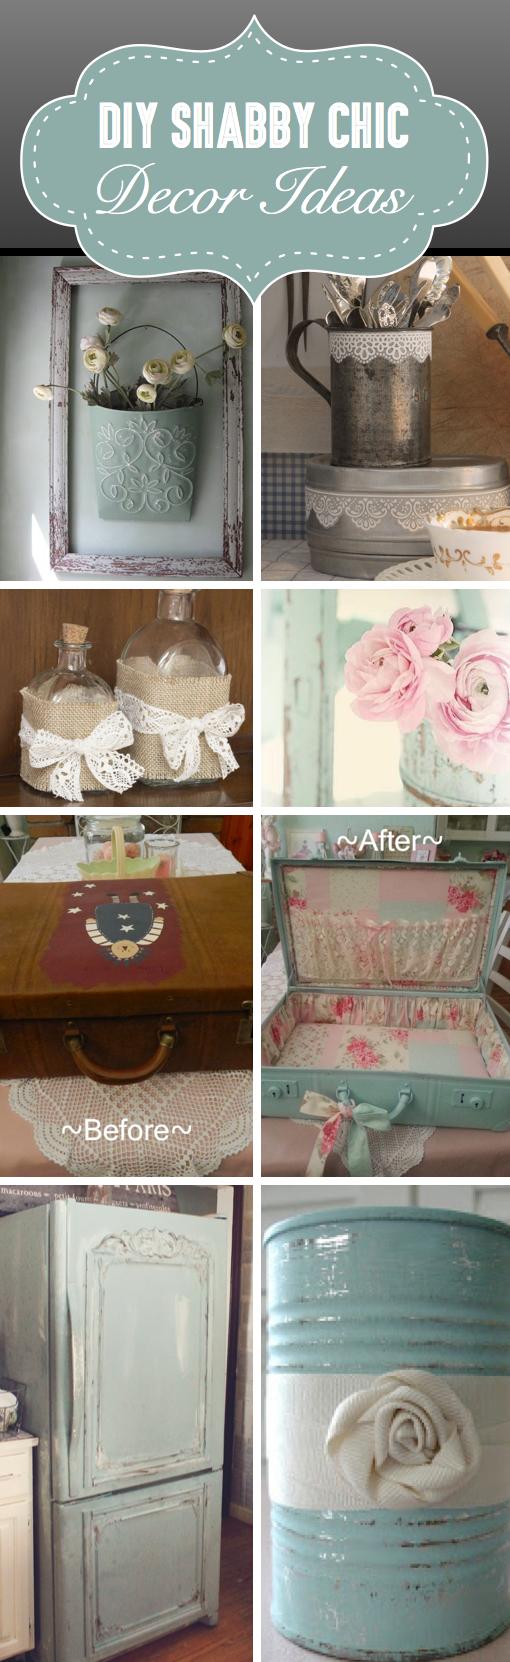 Diy Shabby Chic Decor 25+ diy shabby chic decor ideas for women who love the retro